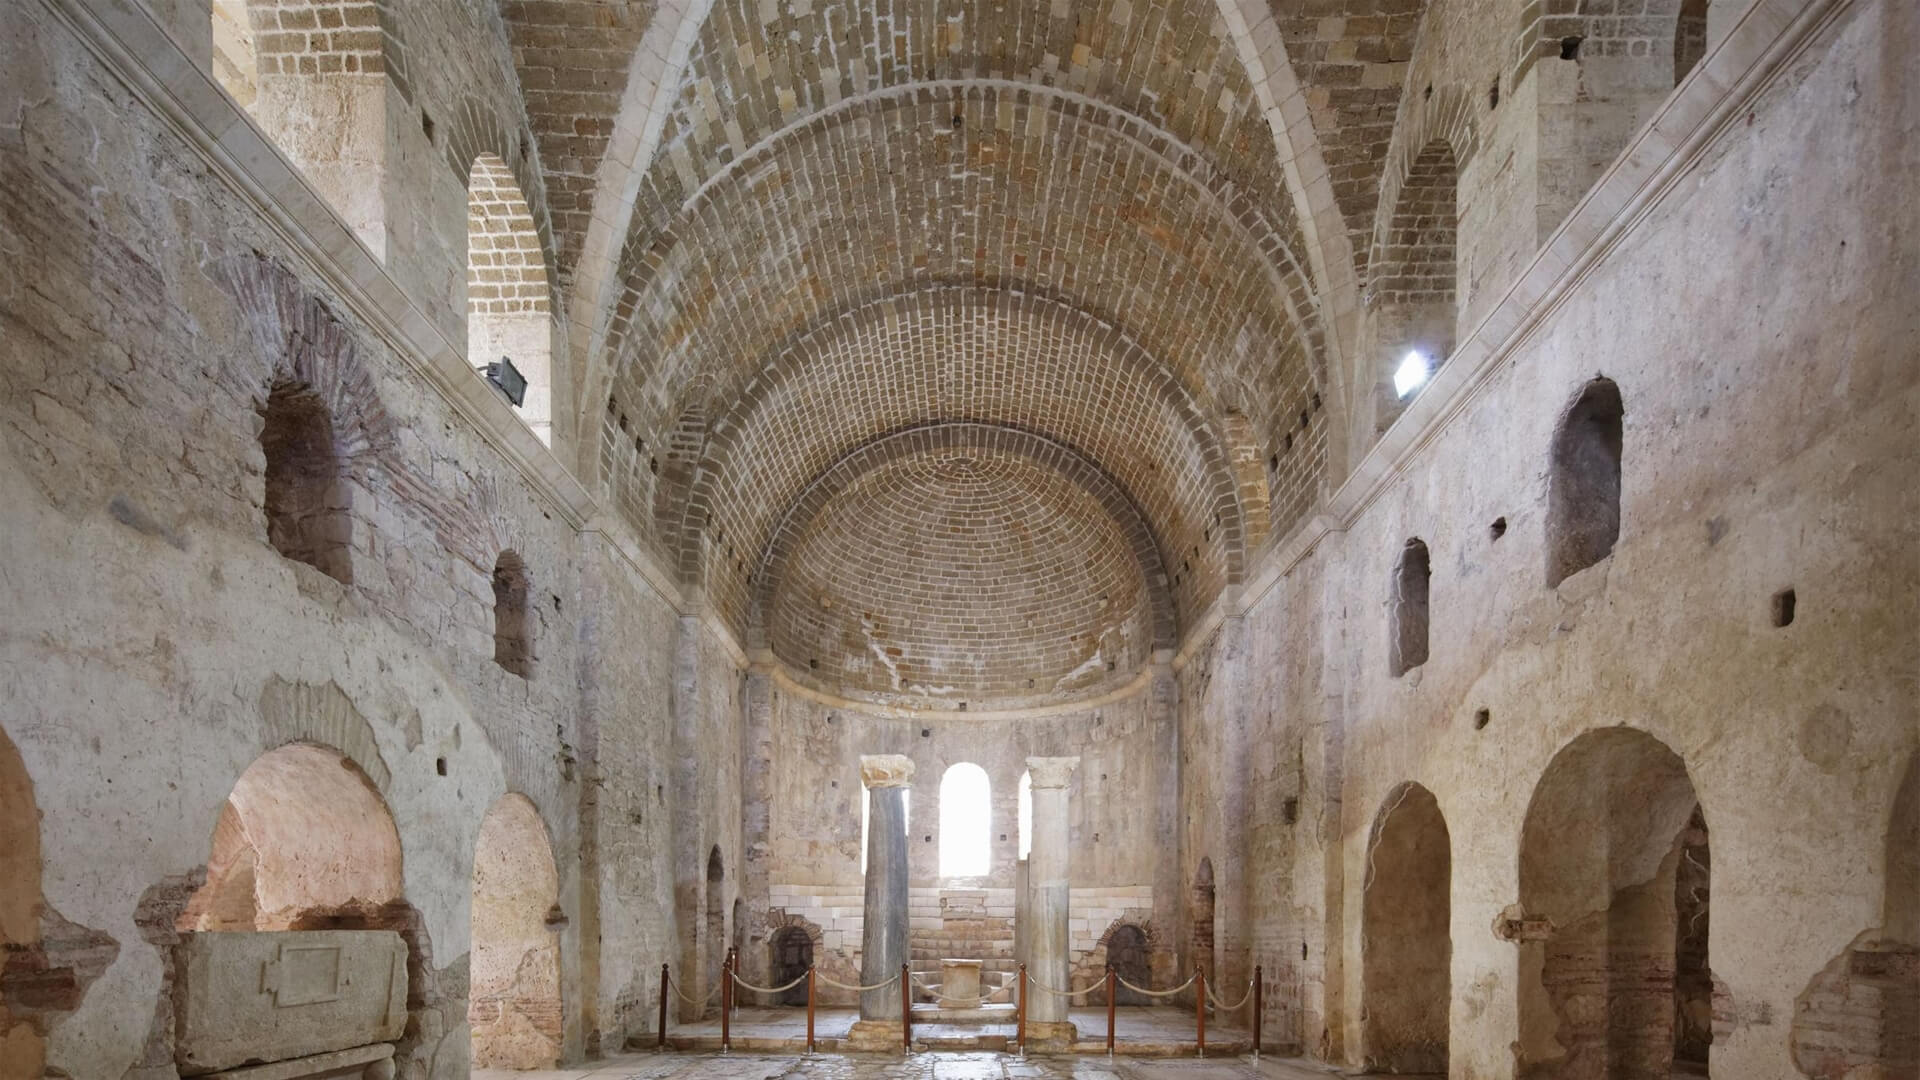 ST.NİCHOLAS (NOEL BABA) KİLİSESİ